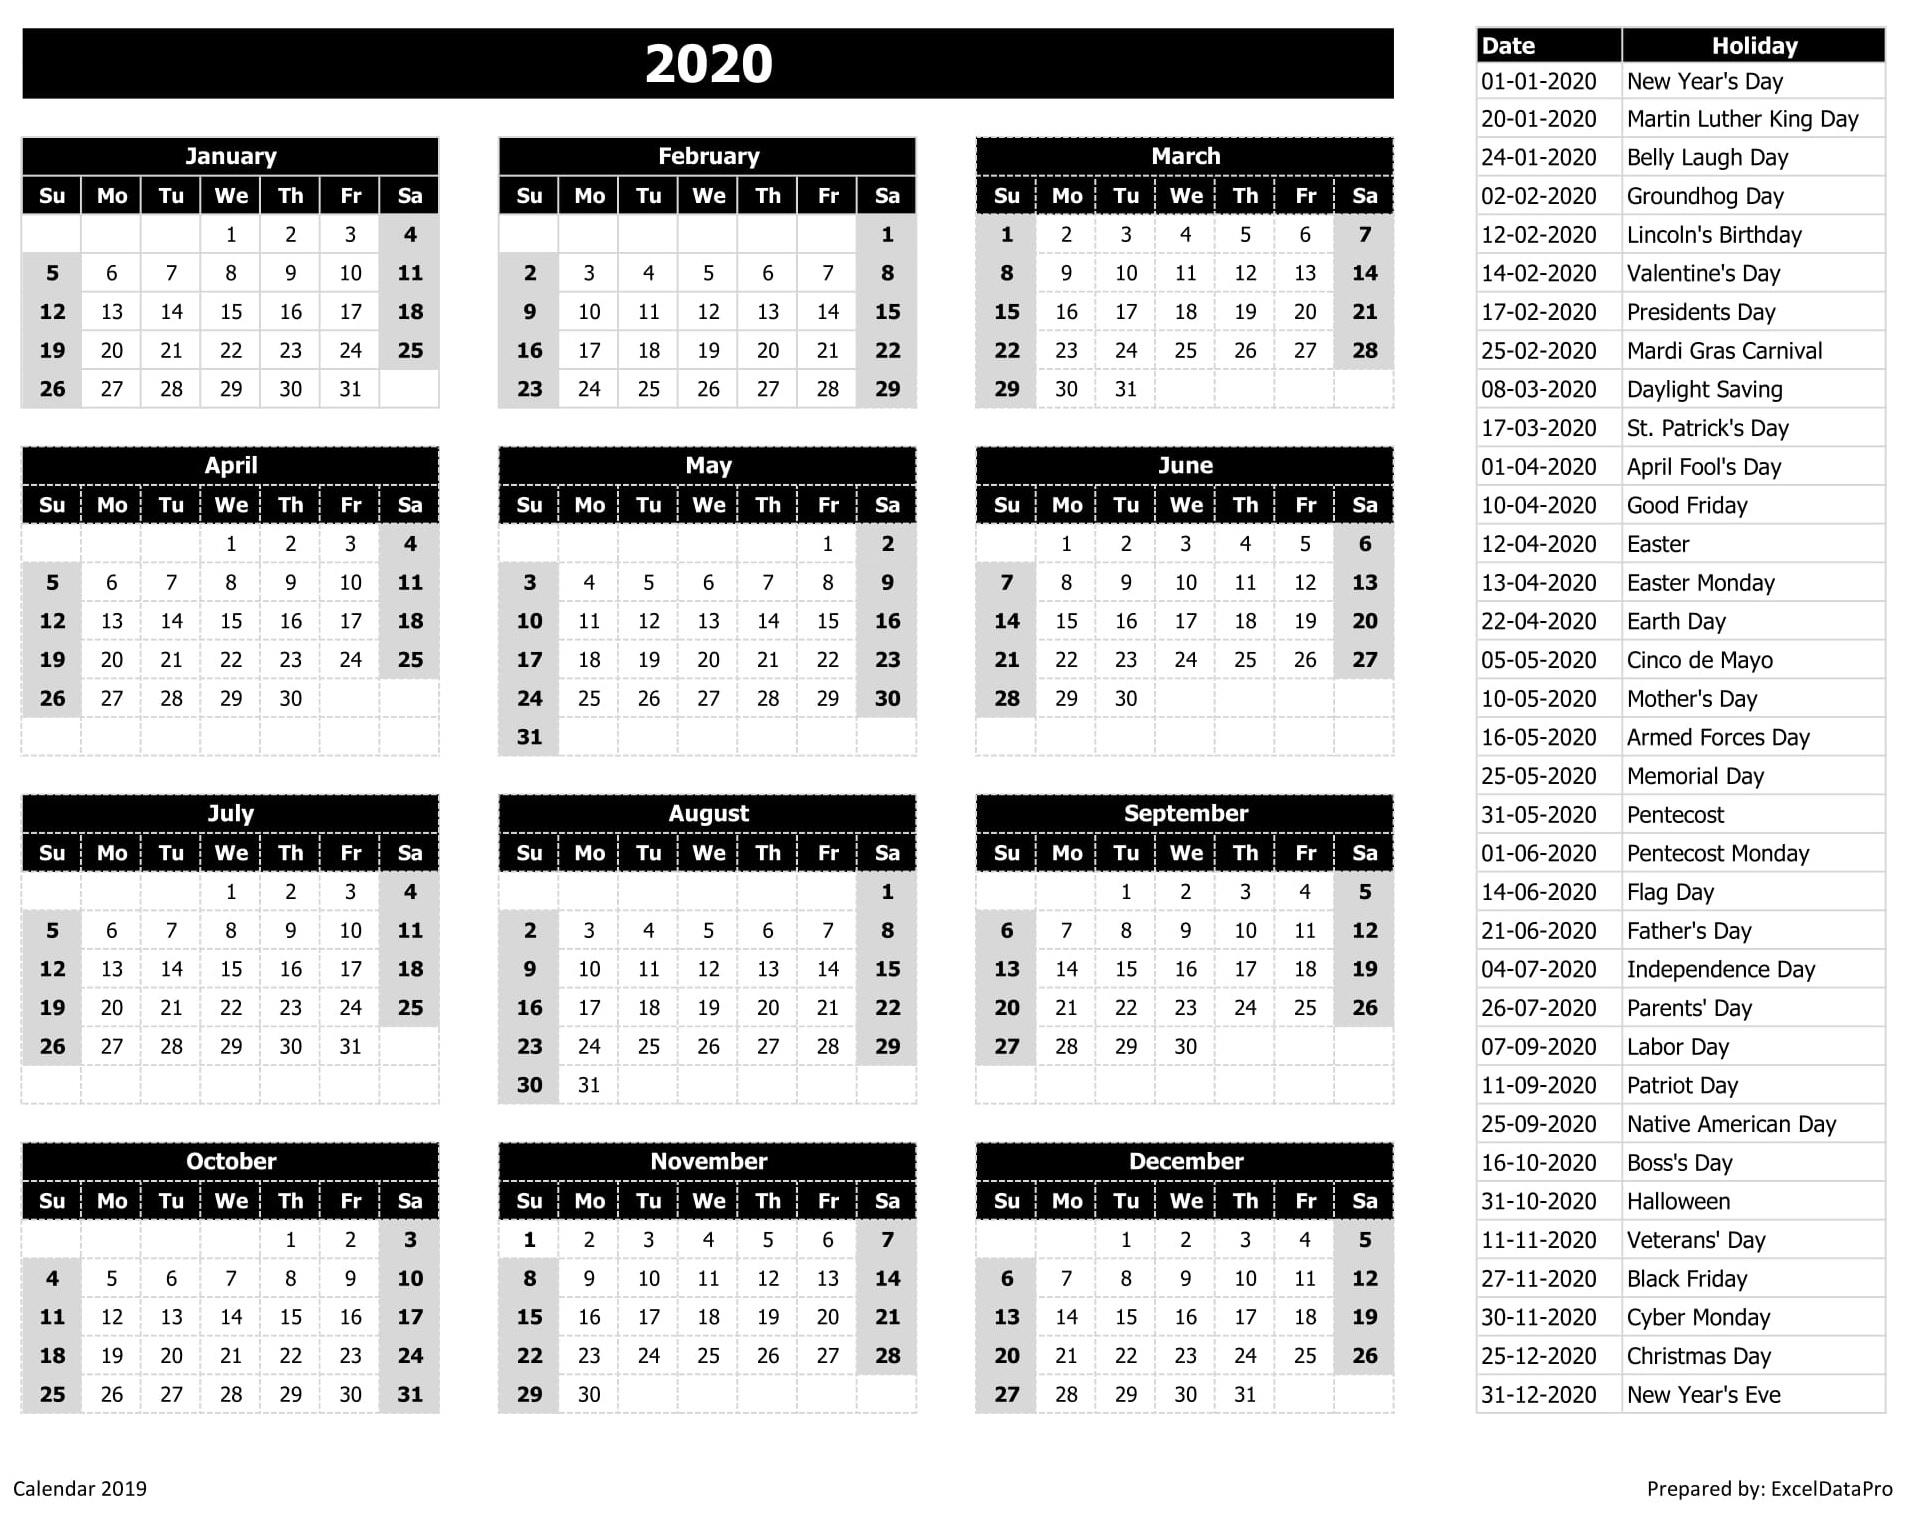 2020 Calendar Festival List – Get Your Calendar Printable